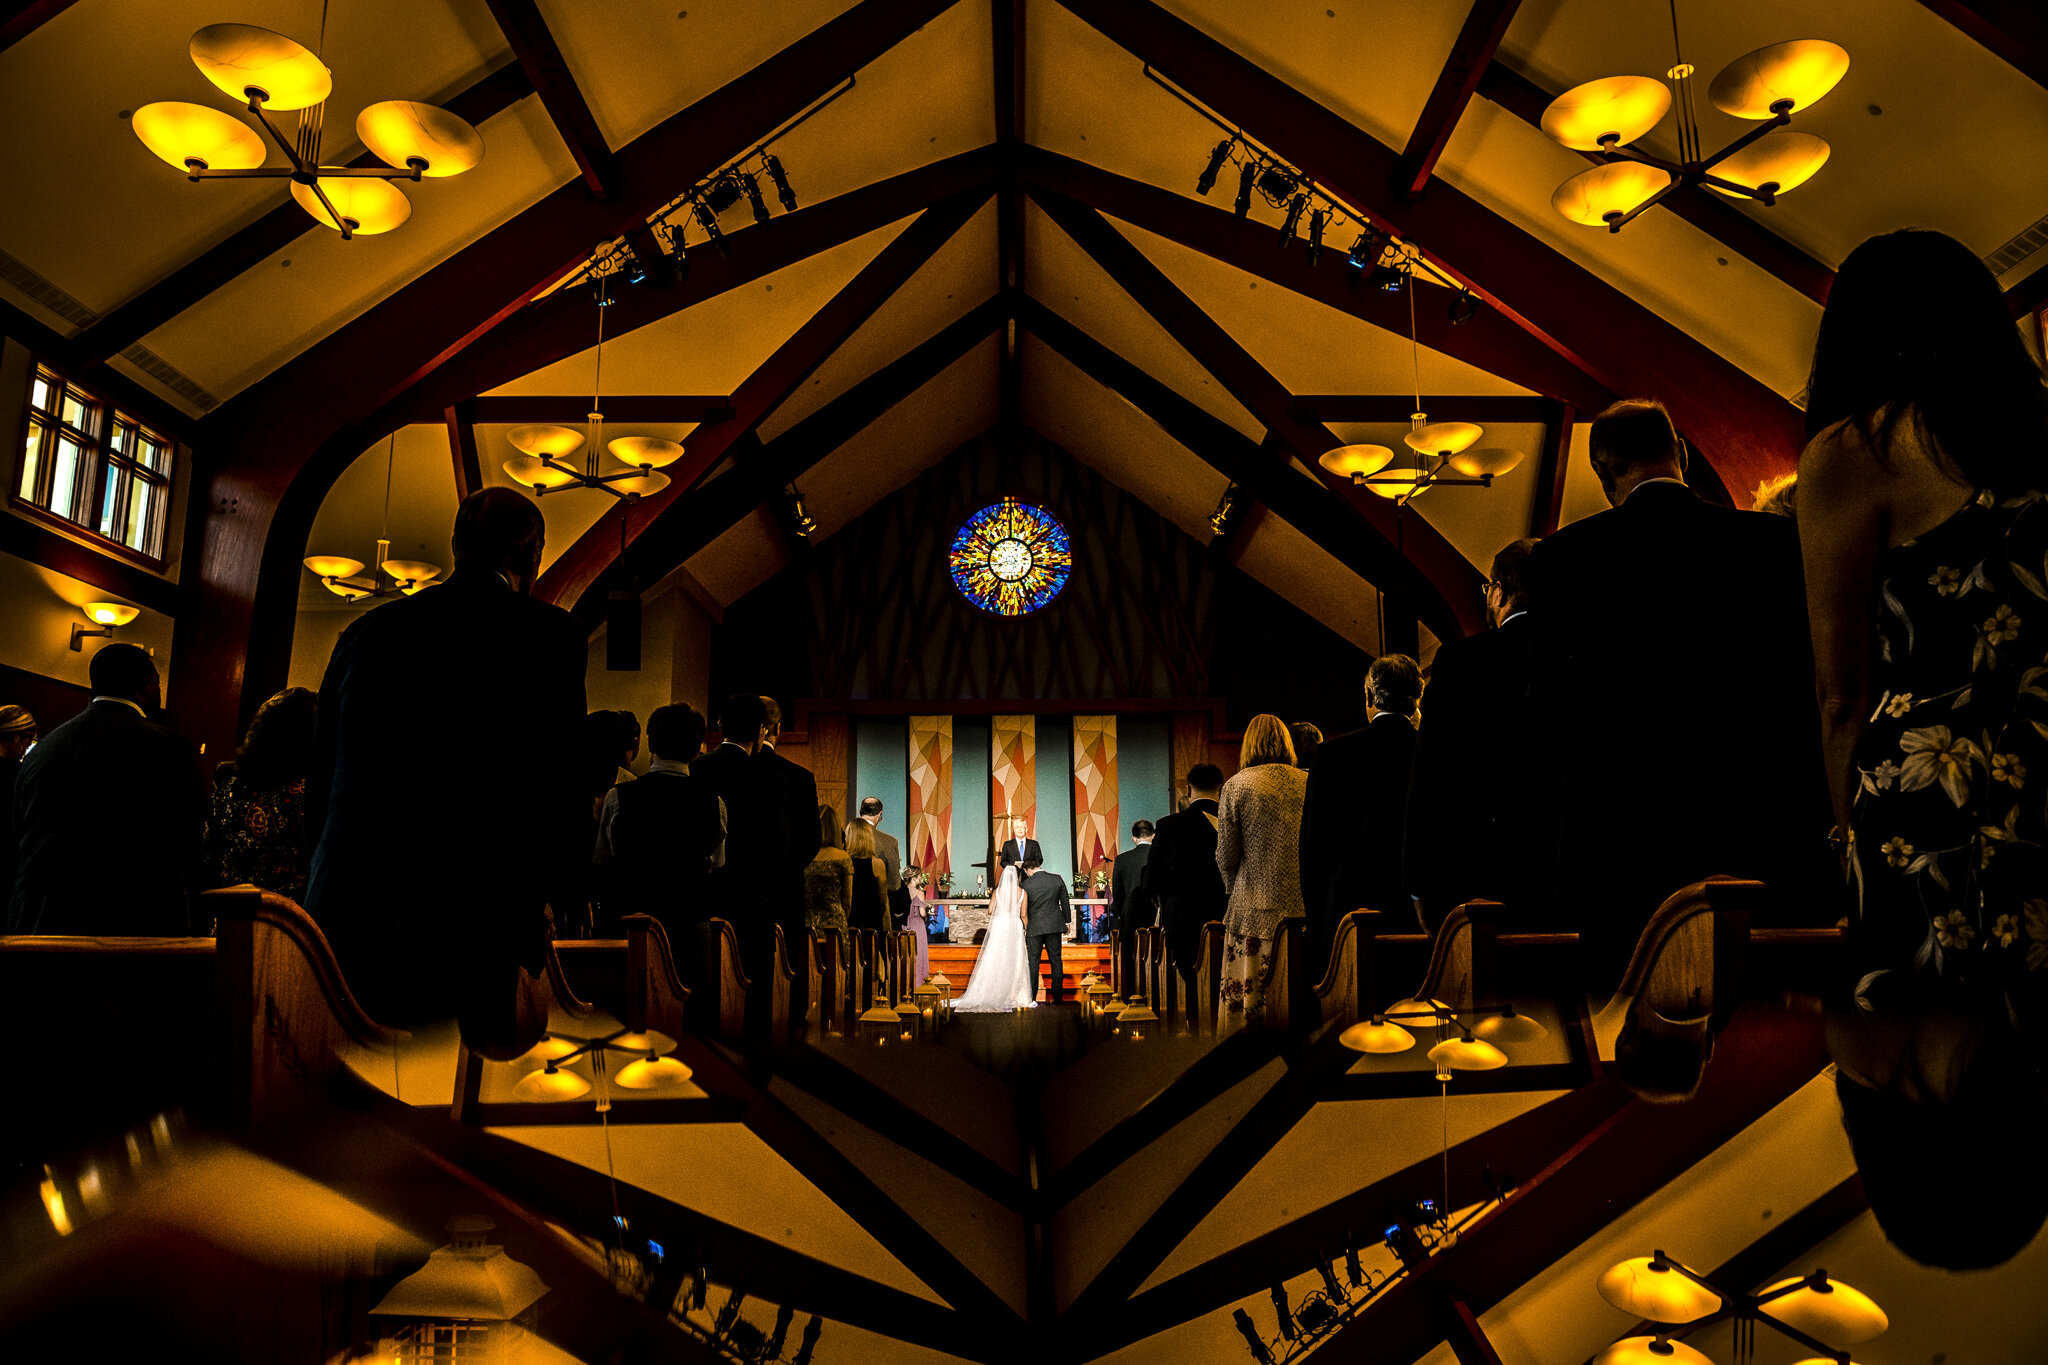 Coyle-Forsgate-Country-Club-Wedding-Photographer-11.JPG